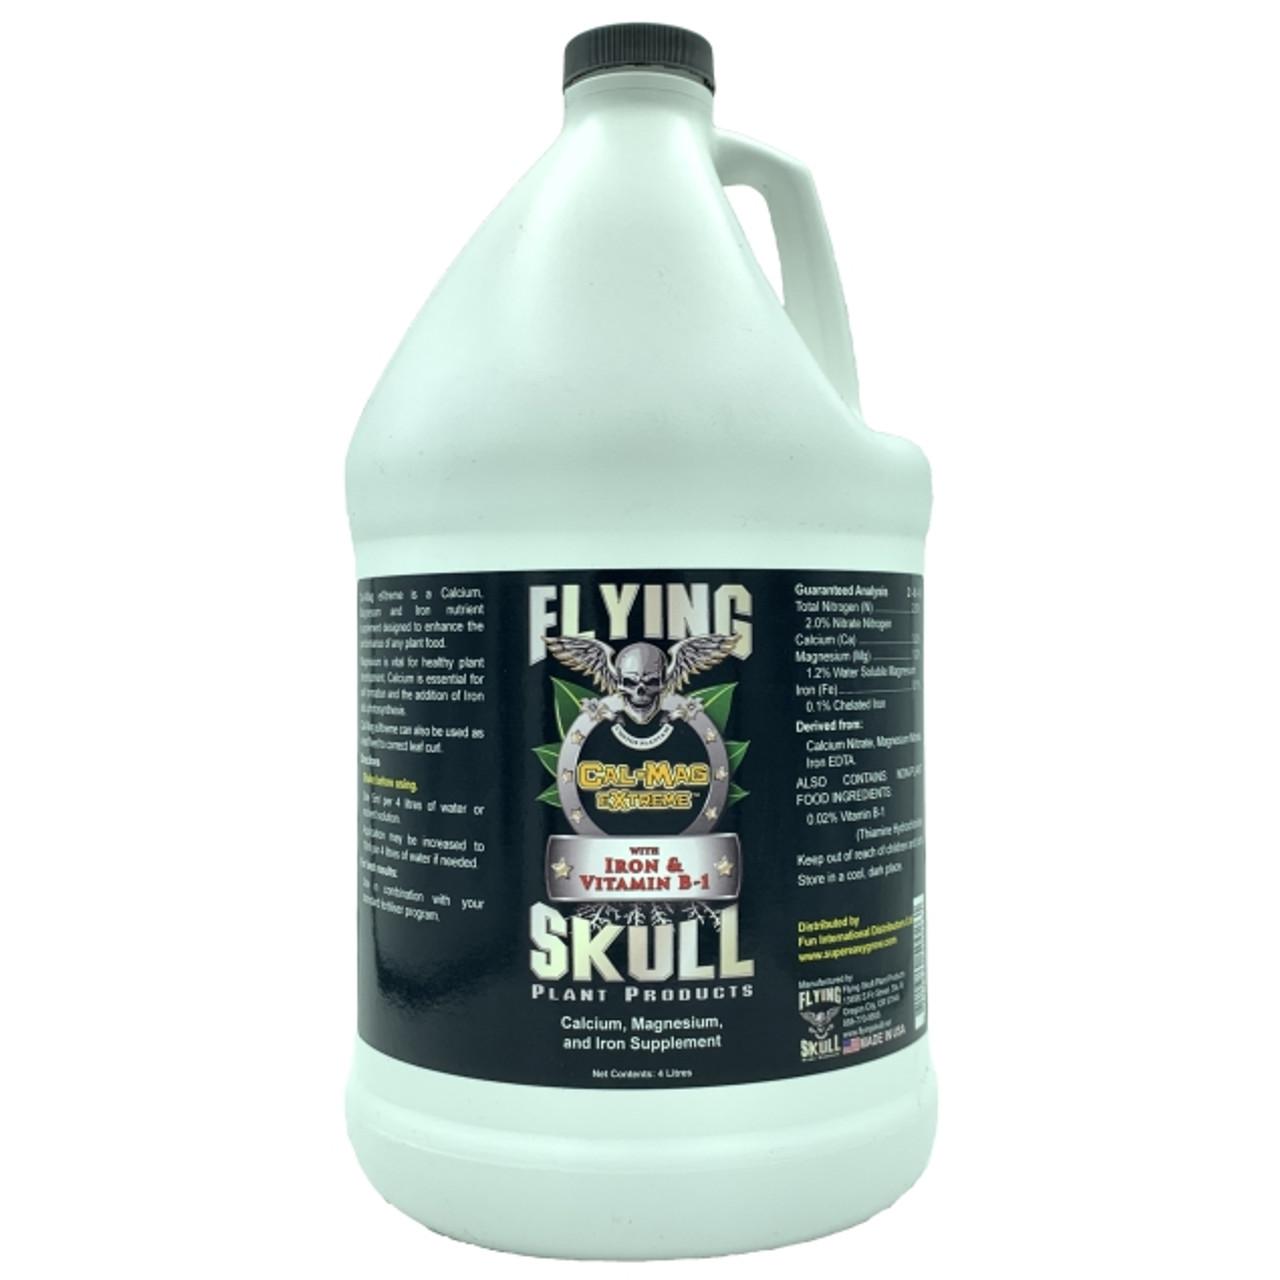 Flying Skull Cal-Mag eXtreme 4 litre Bottle